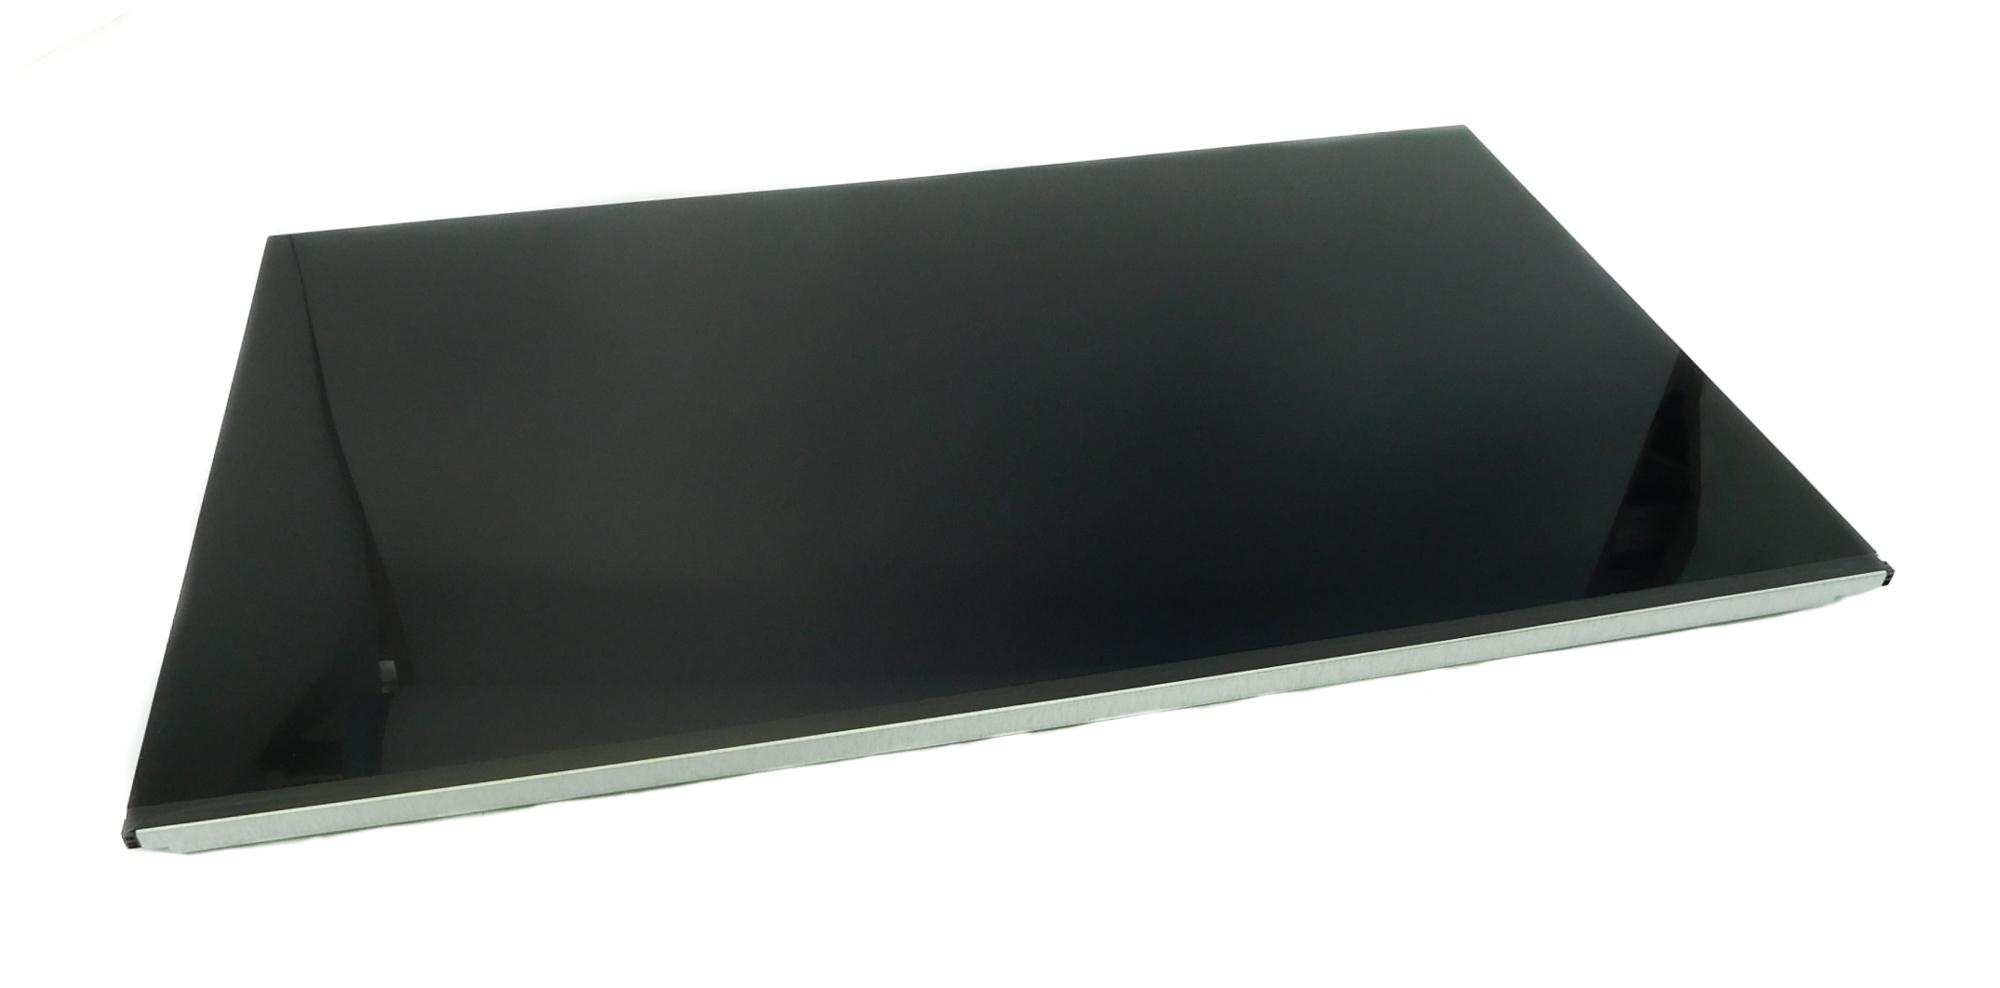 Innolux M238HCA-L3Z FHD Screen LCD Panel /f HP Pavilion 24-xa1009na AiO PC